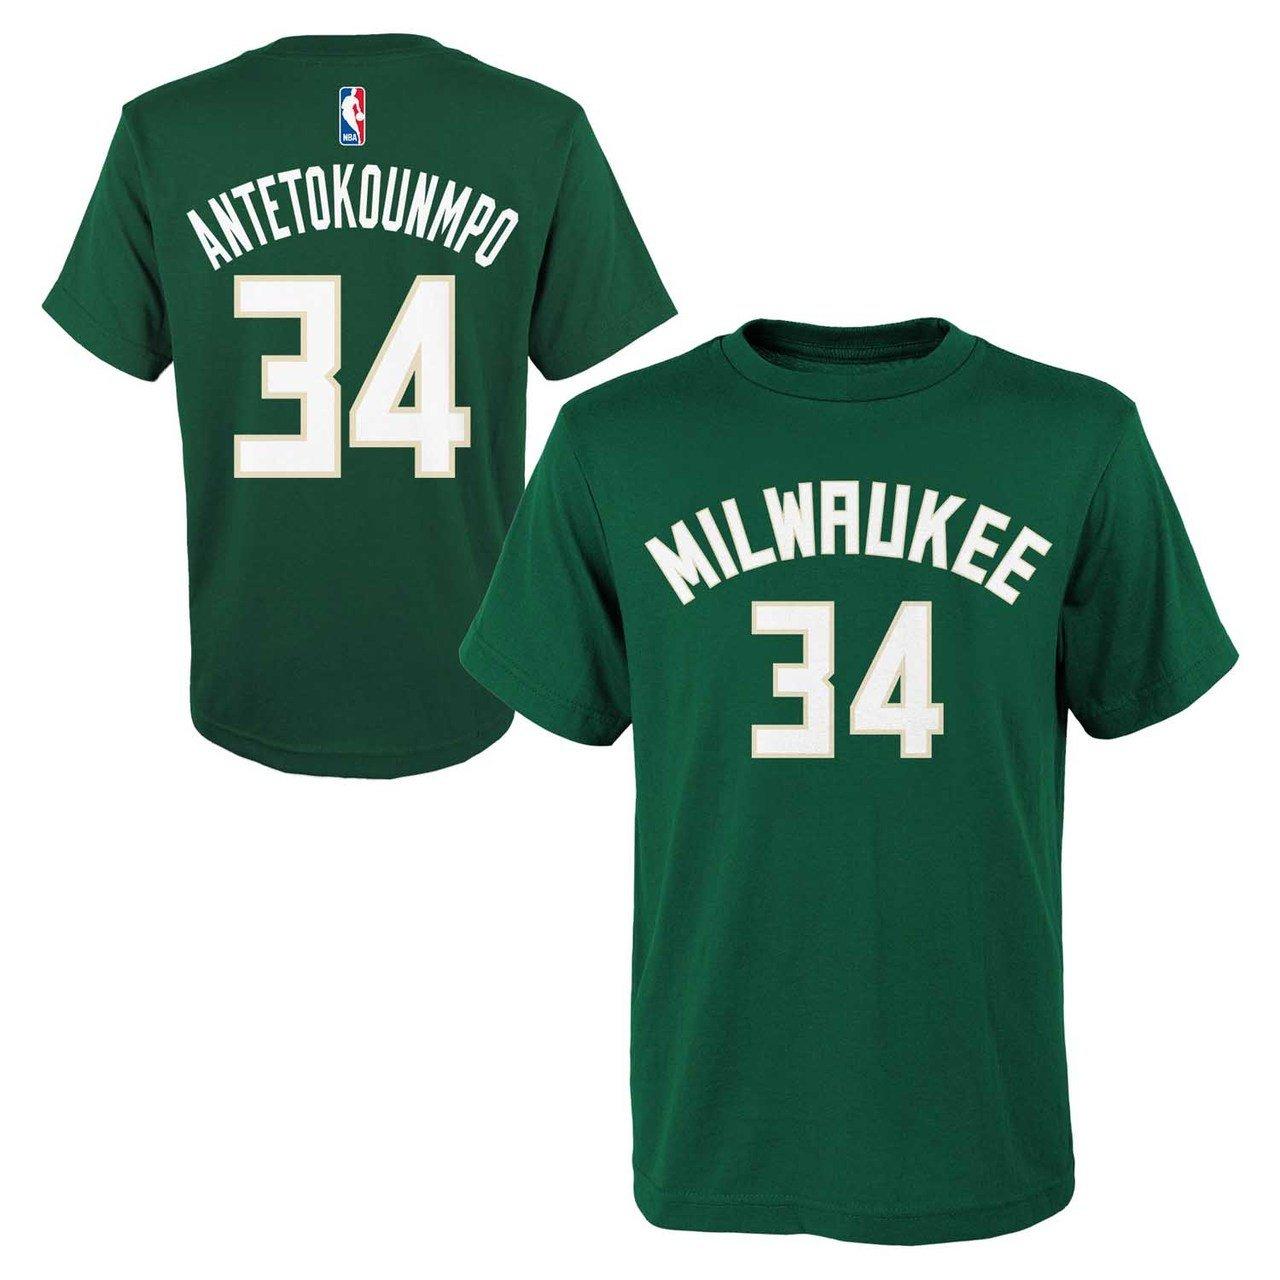 Giannis Antetokounmpo Milwaukee Bucks #34 NBA Youth Player Name & Number T- Shirt,